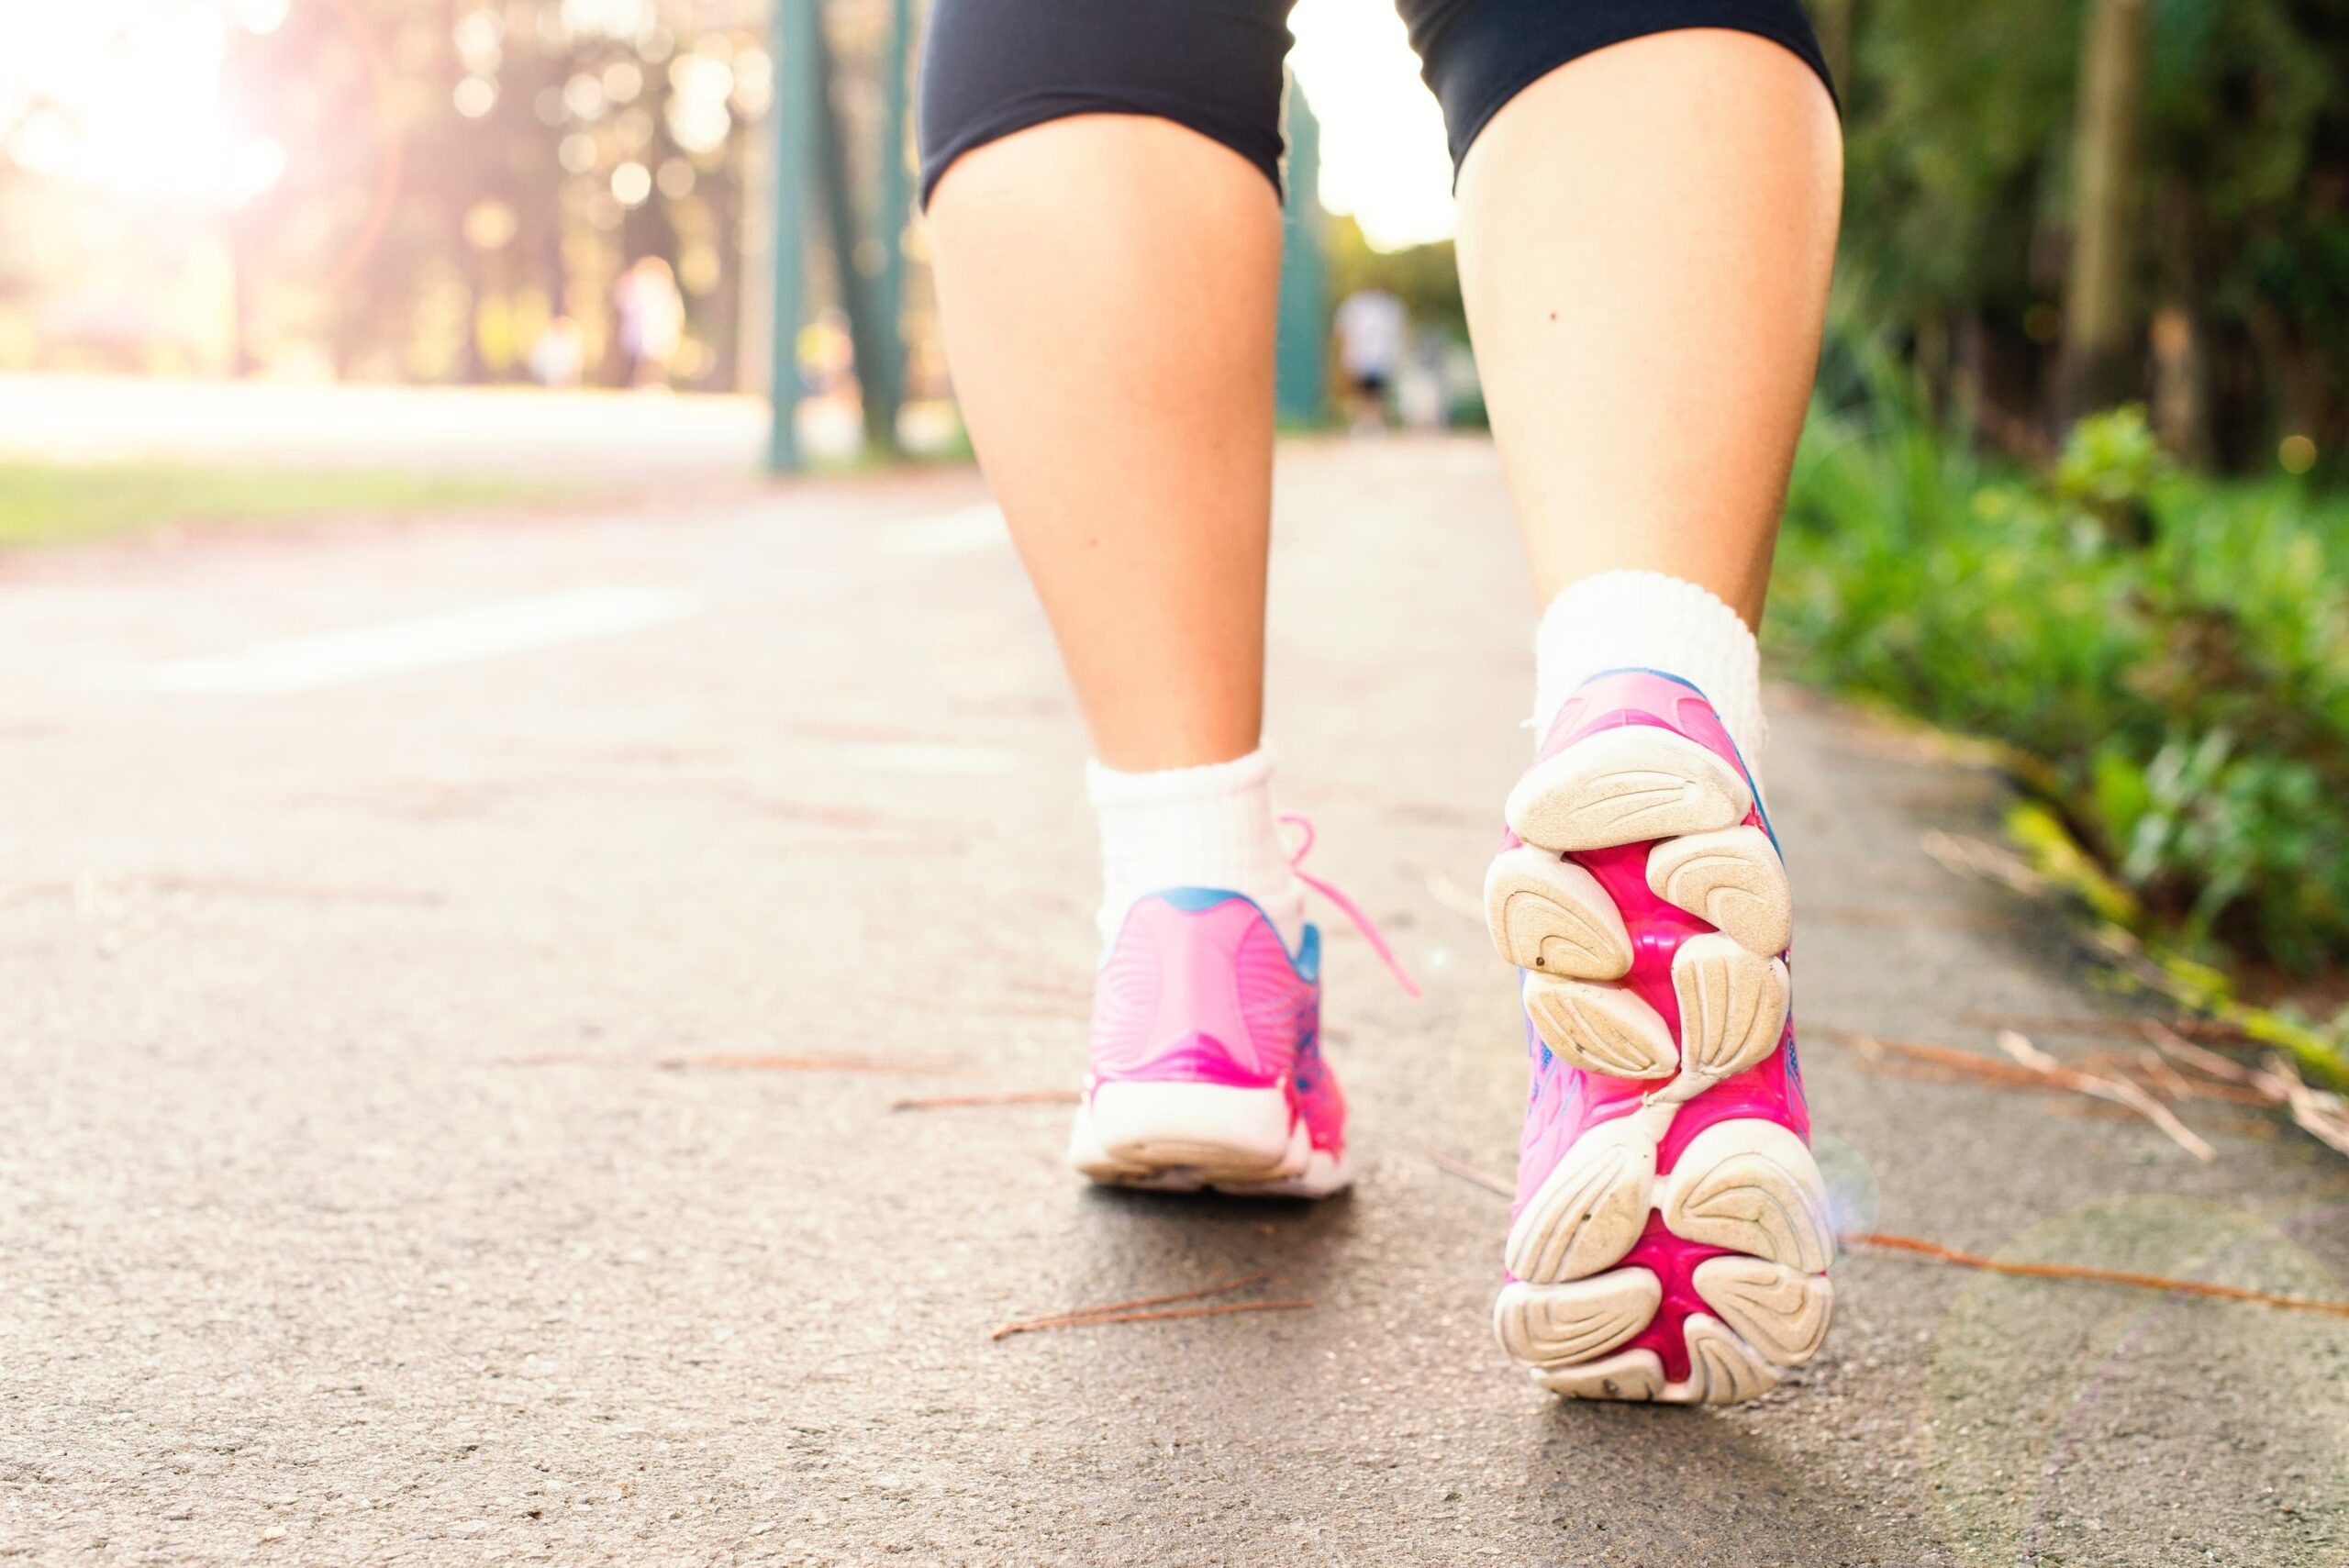 walking boosting exercise